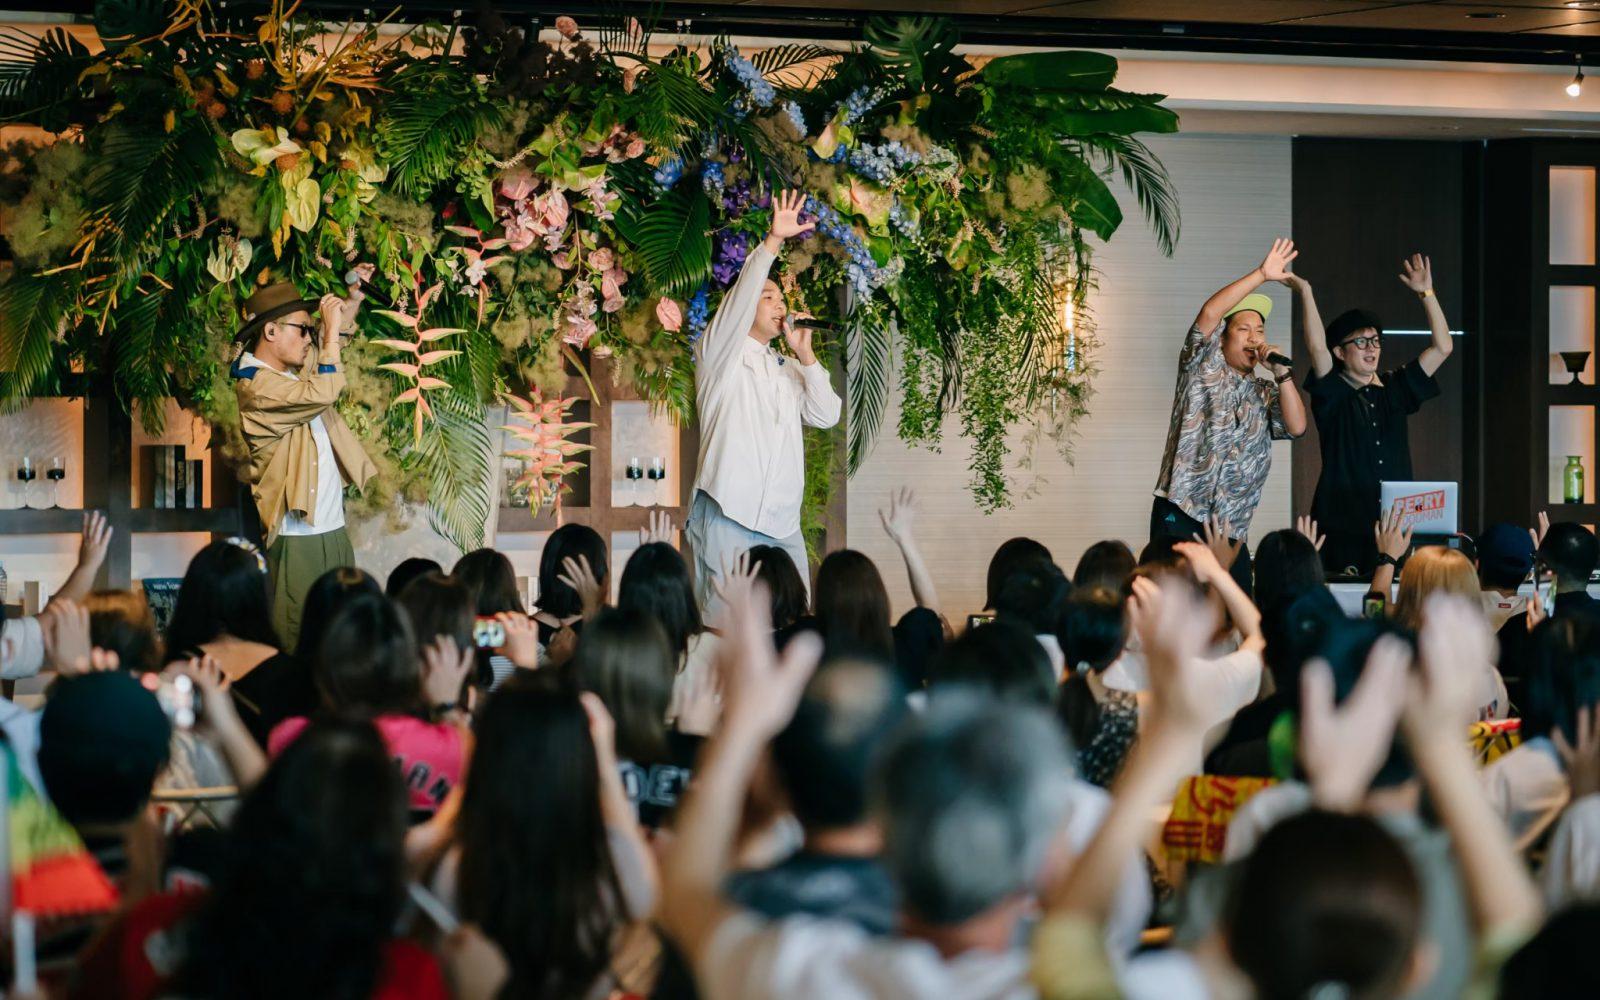 BERRY GOOD MAN 「ベリーグッドマンへの道 WEDDING TOUR 2021」/tour produce,decoration work/花ノ結婚式屋